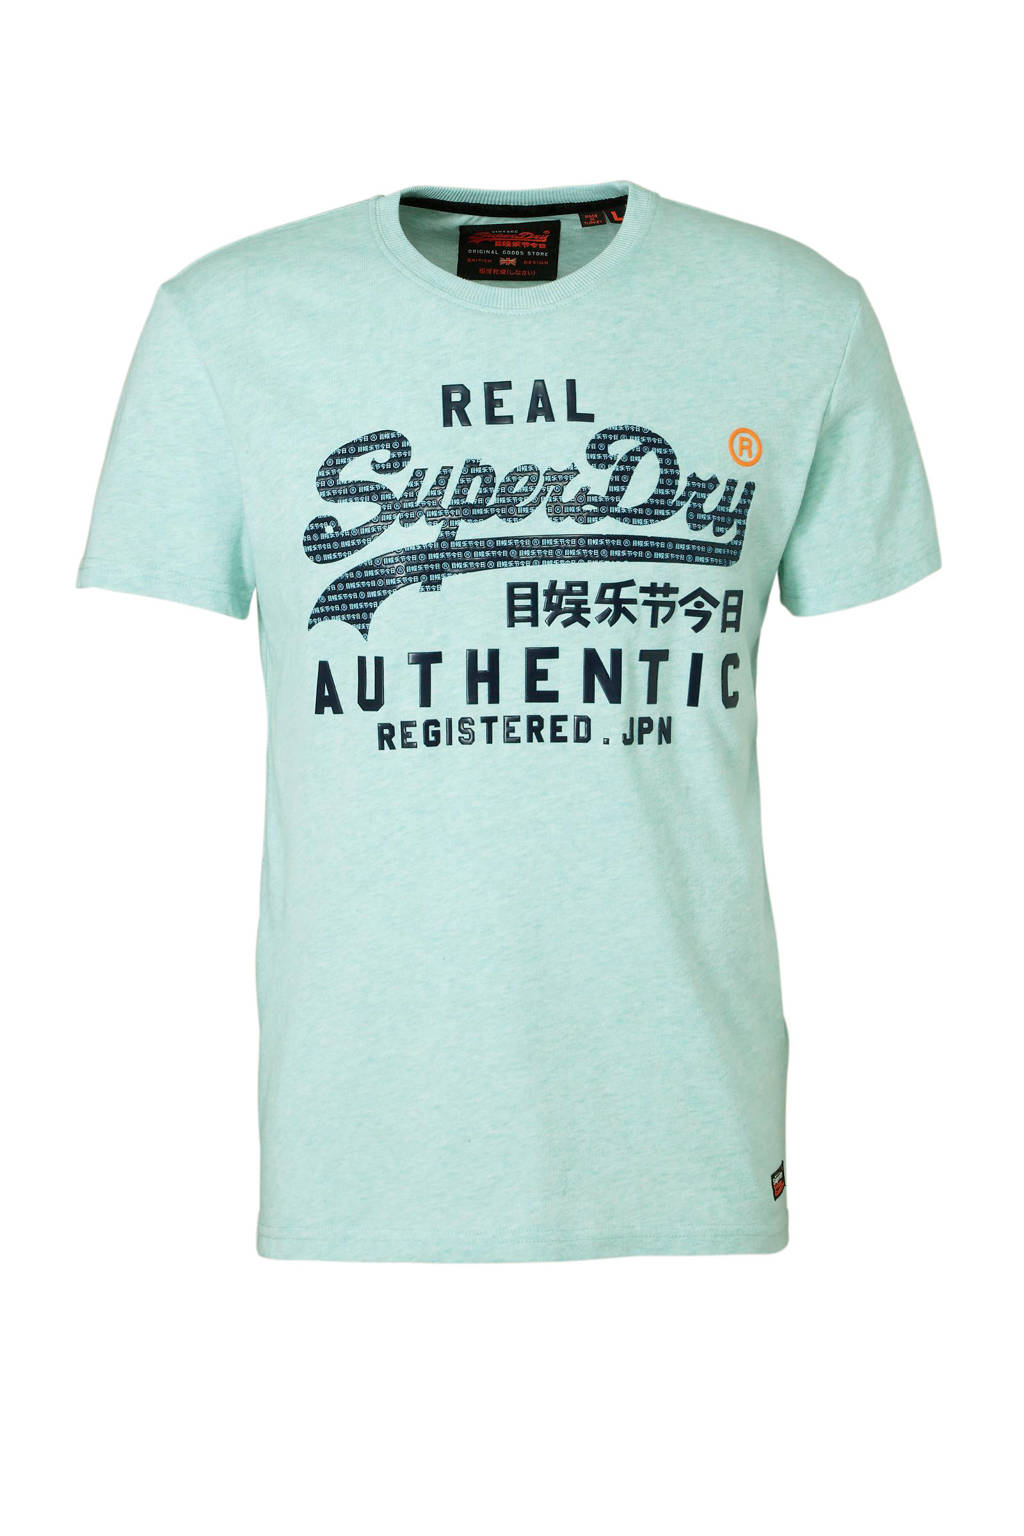 Superdry gemêleerd T-shirt met tekst, Mintgroen